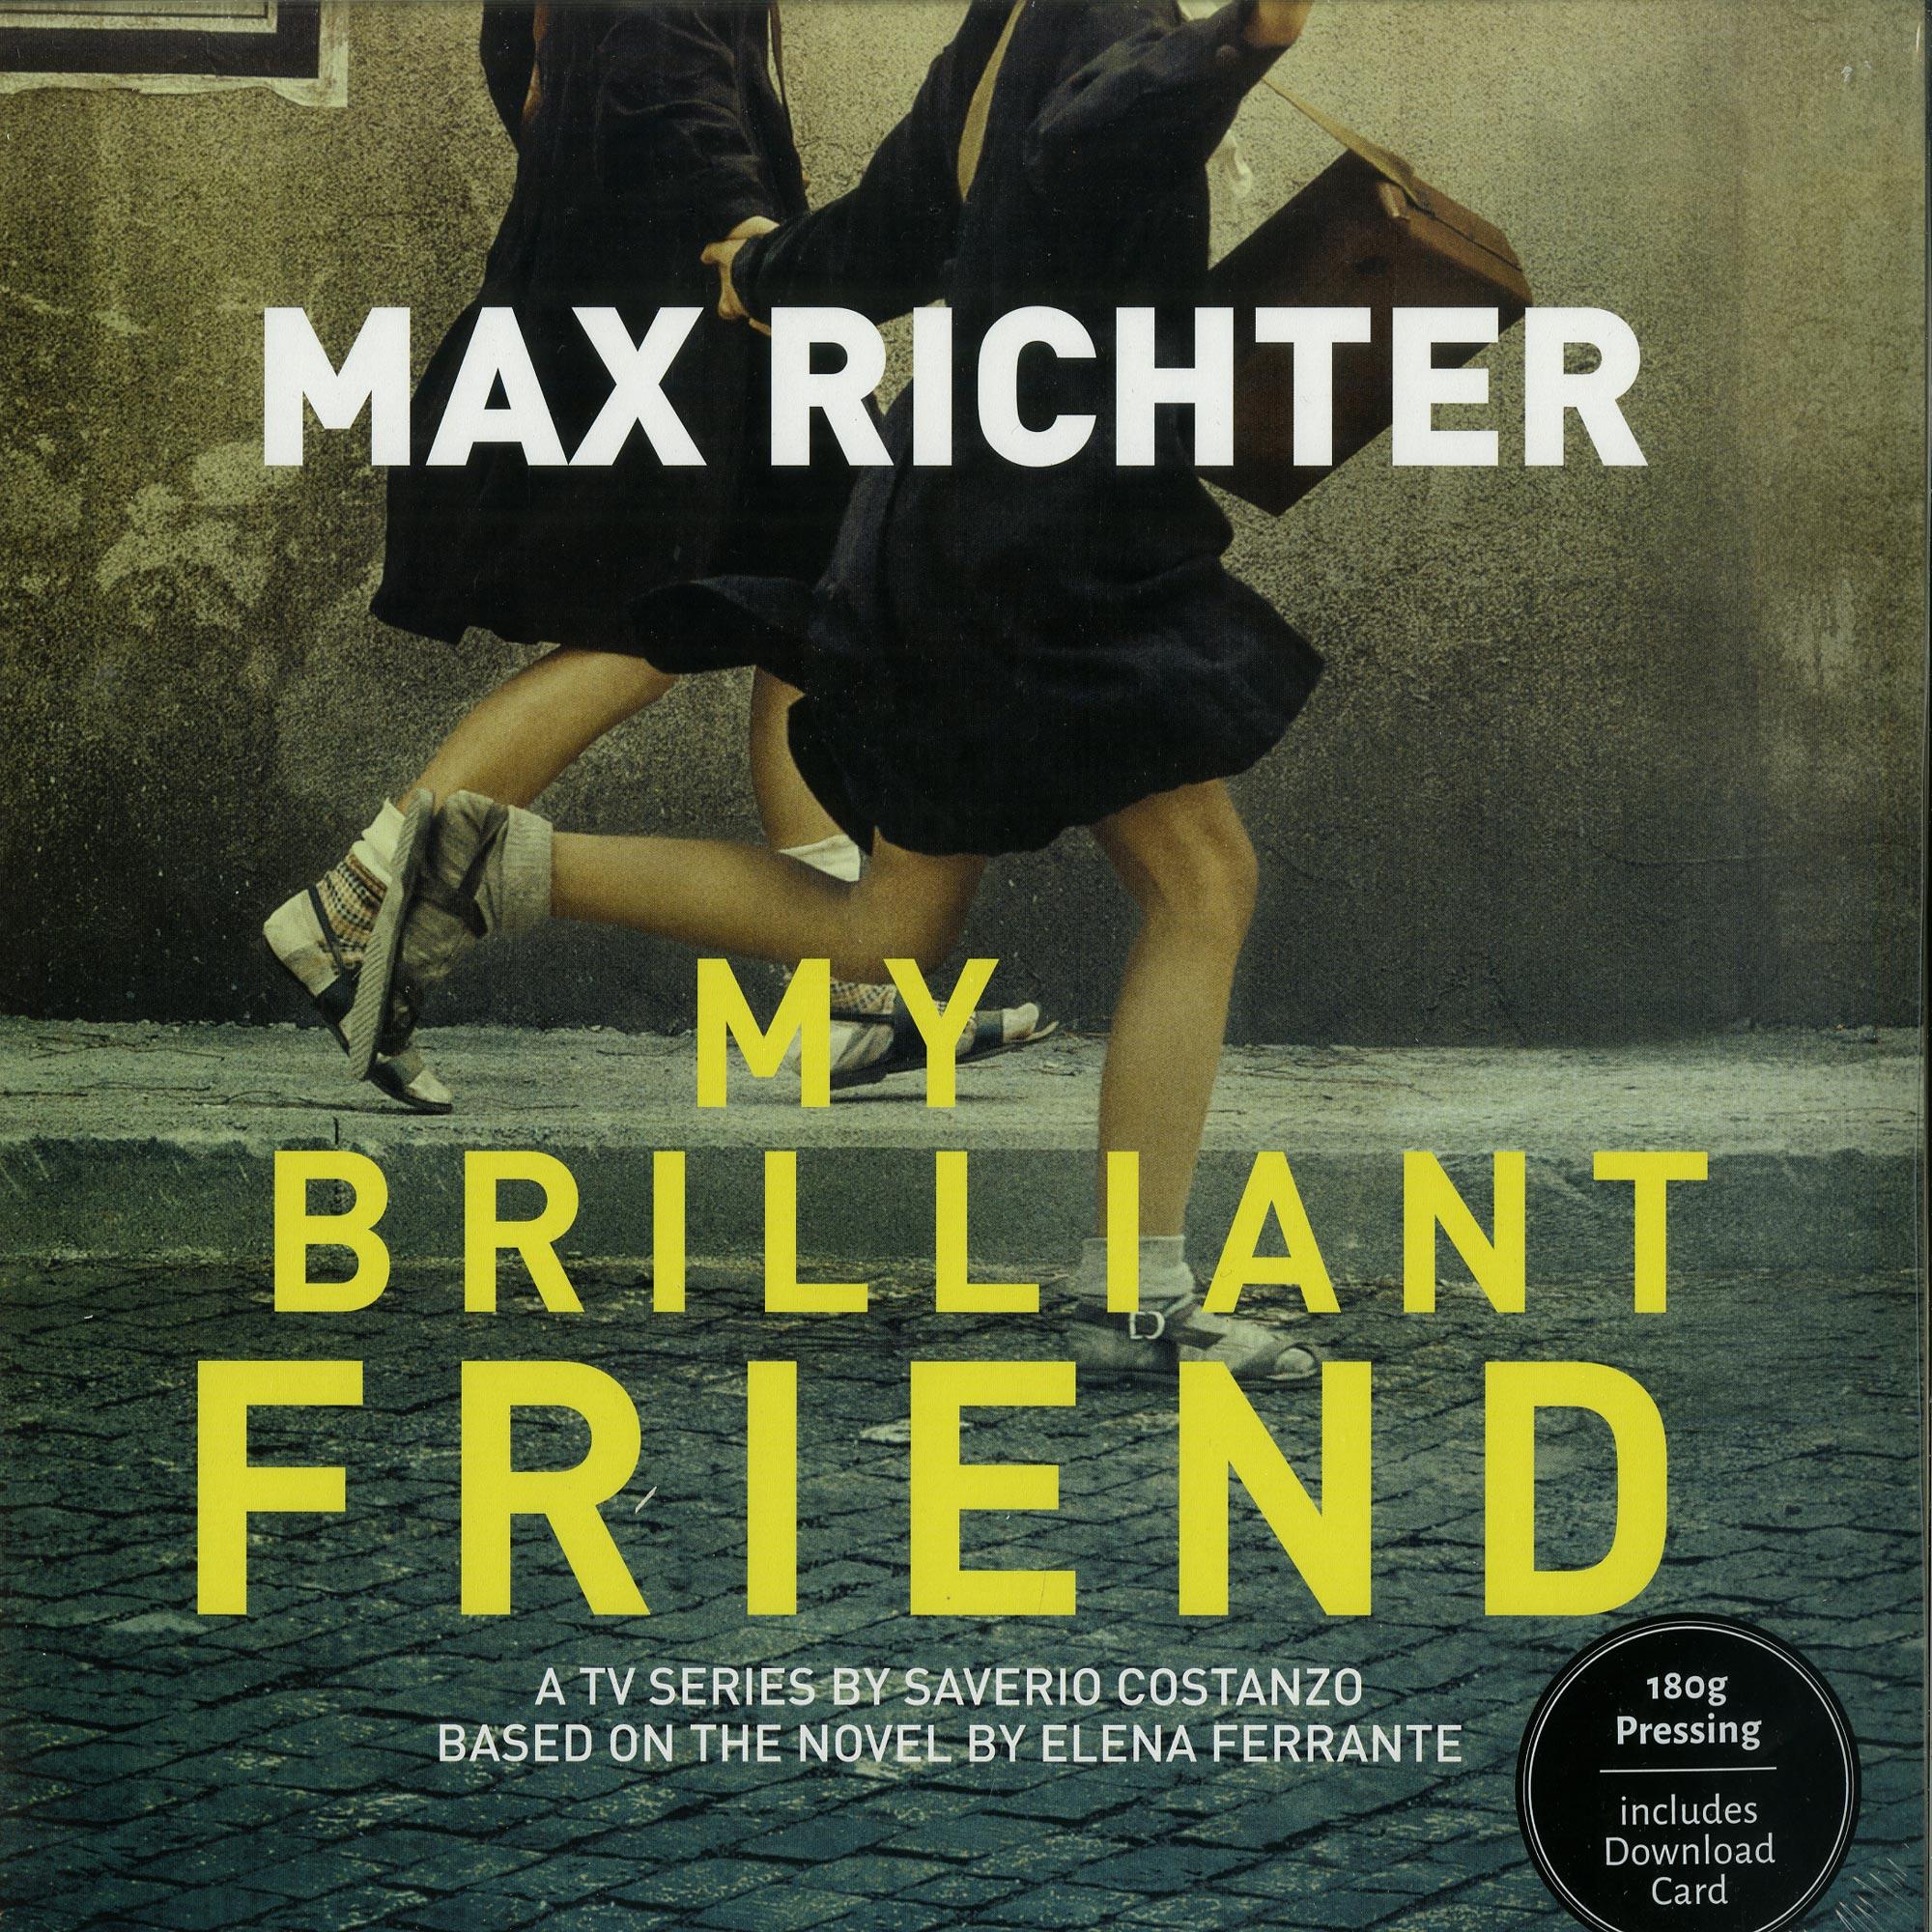 Max Richter - MY BRILLIANT FRIEND O.S.T.